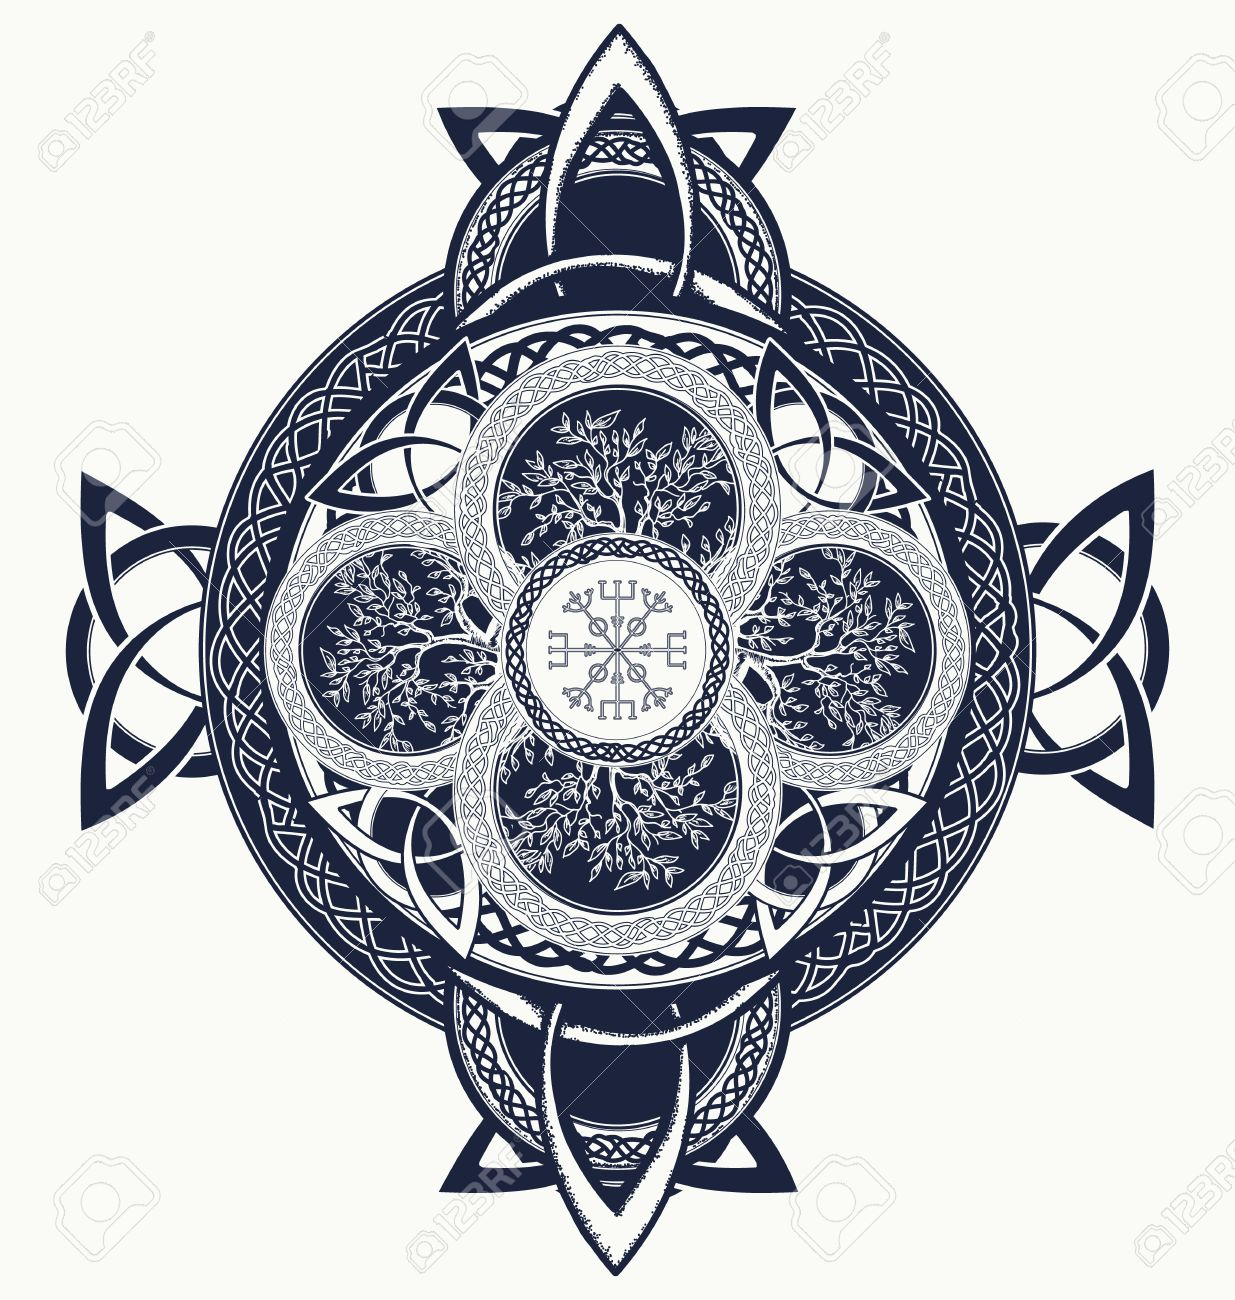 0fb48c436 Celtic cross tattoo. Dragons and celtic tree of life. Mystic tribal  scandinavian and Irish